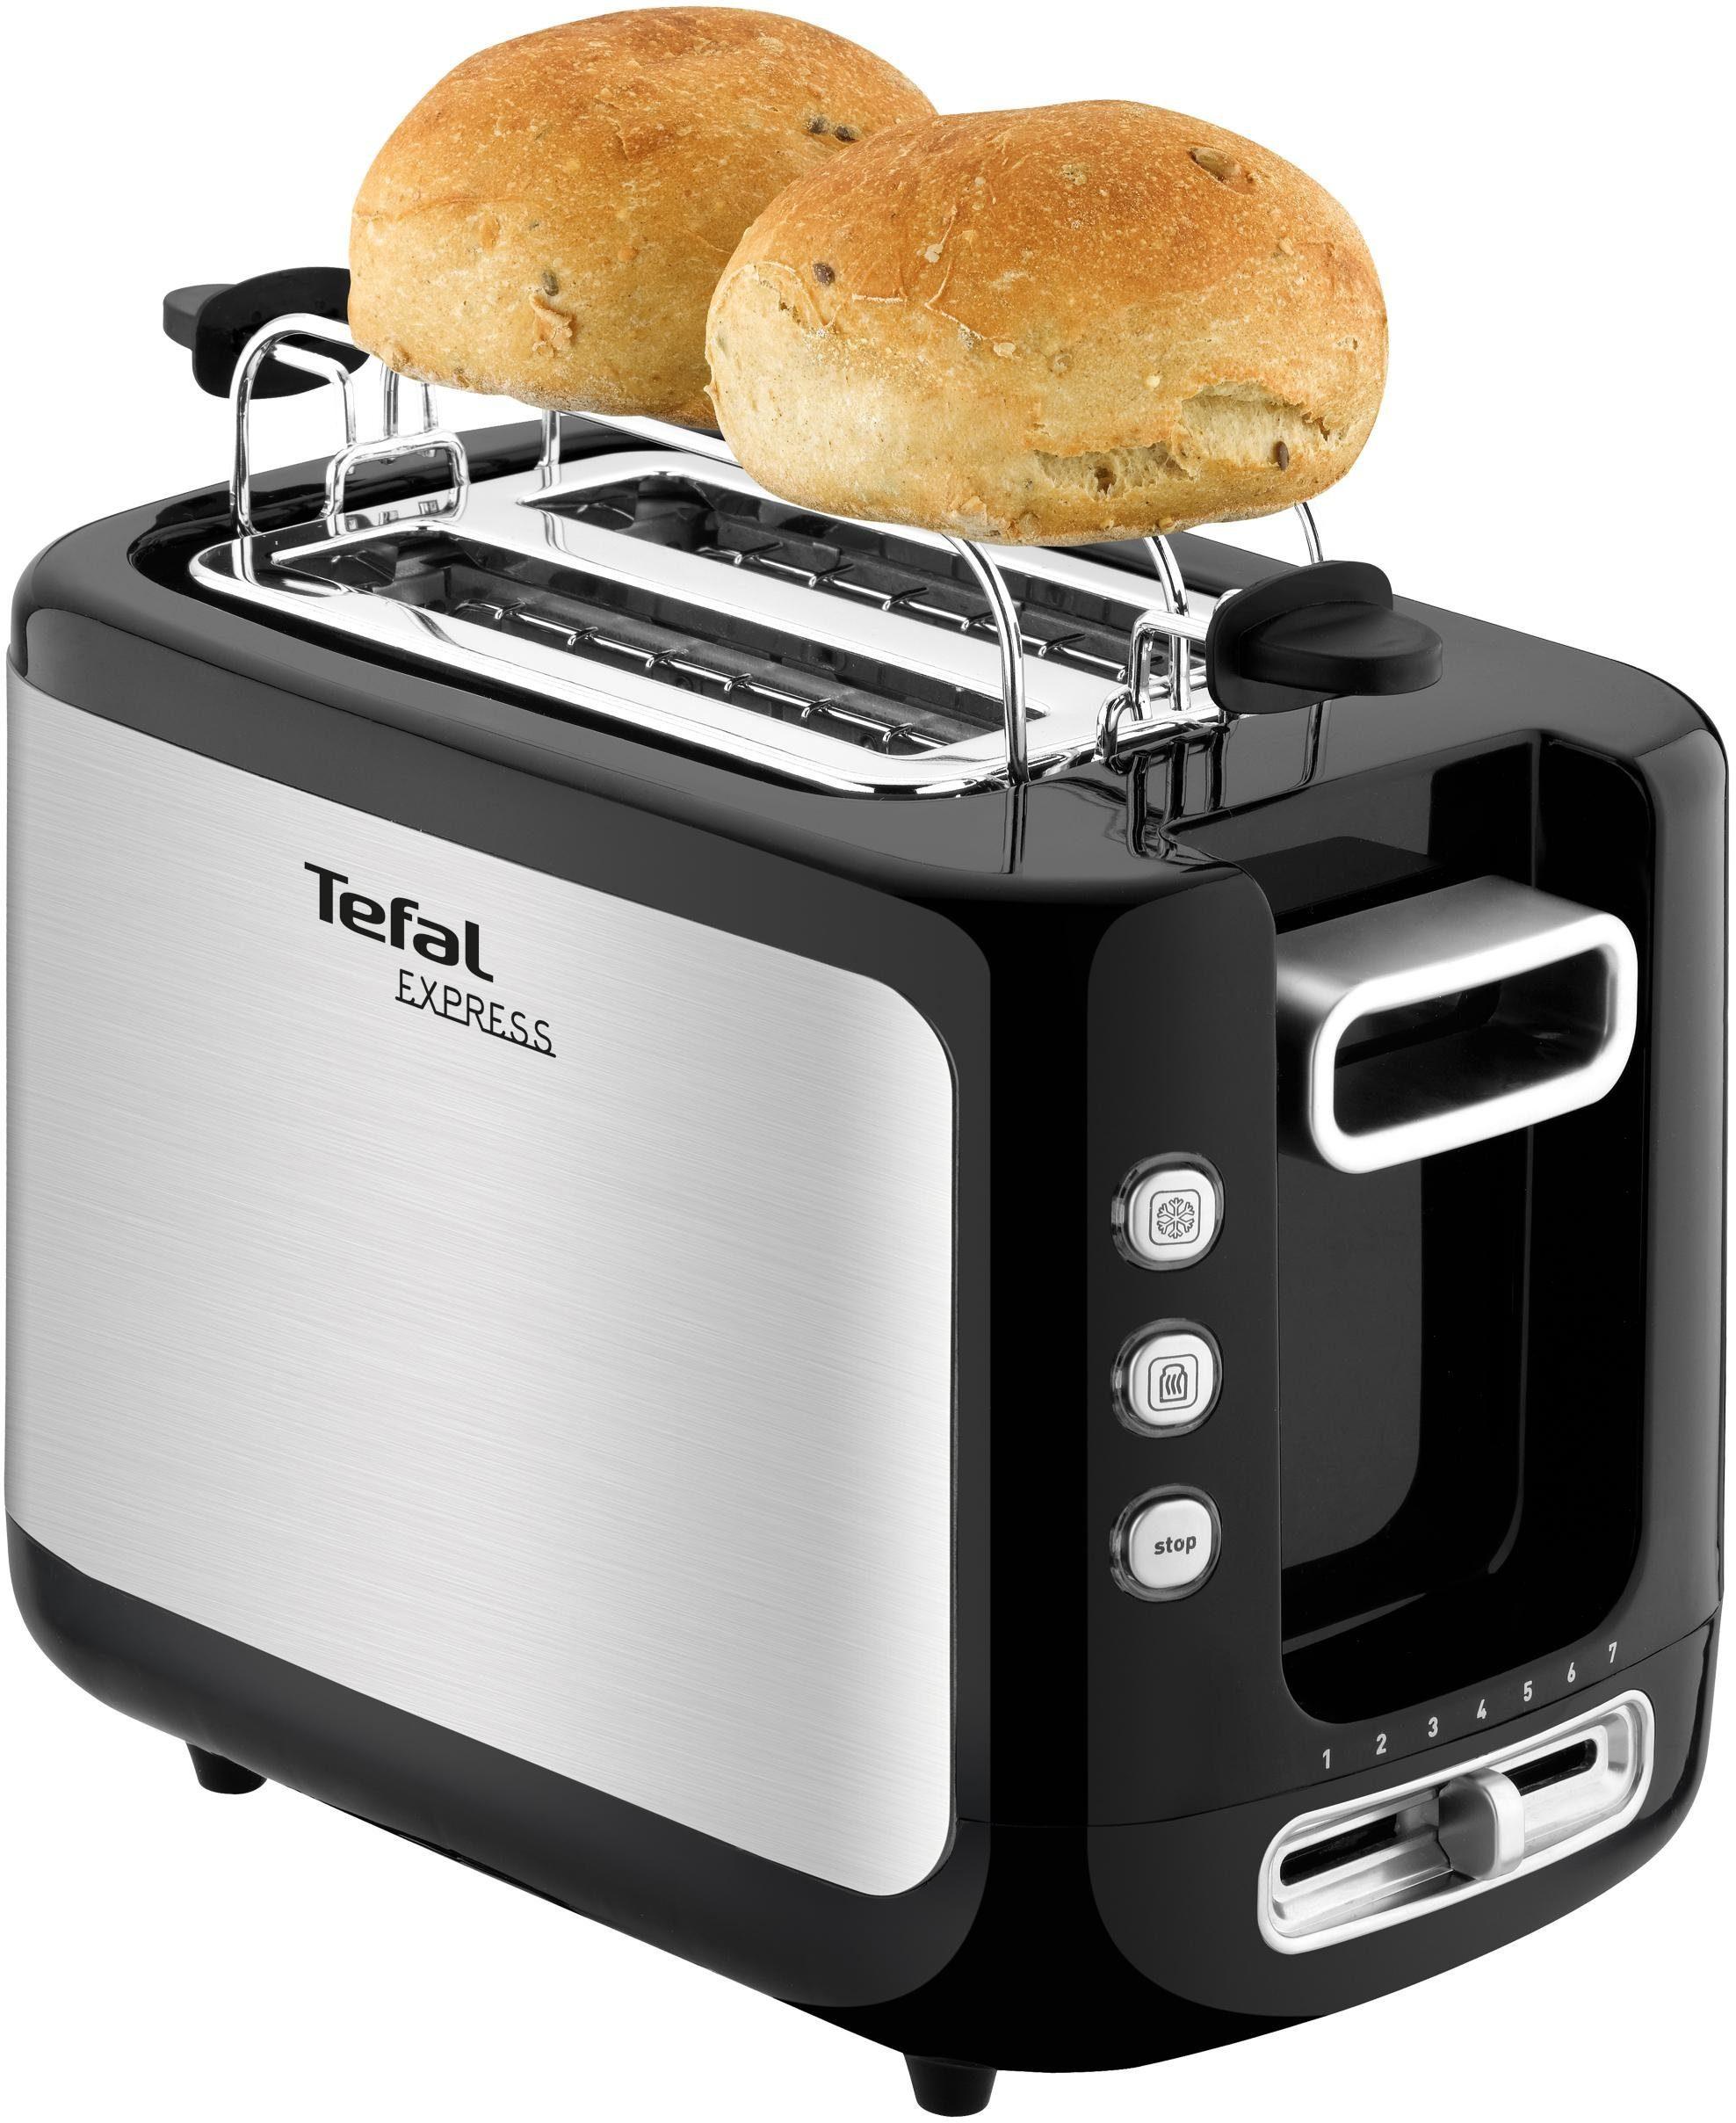 Tefal Toaster TT3650 Express, für 2 Scheiben, 850 Watt